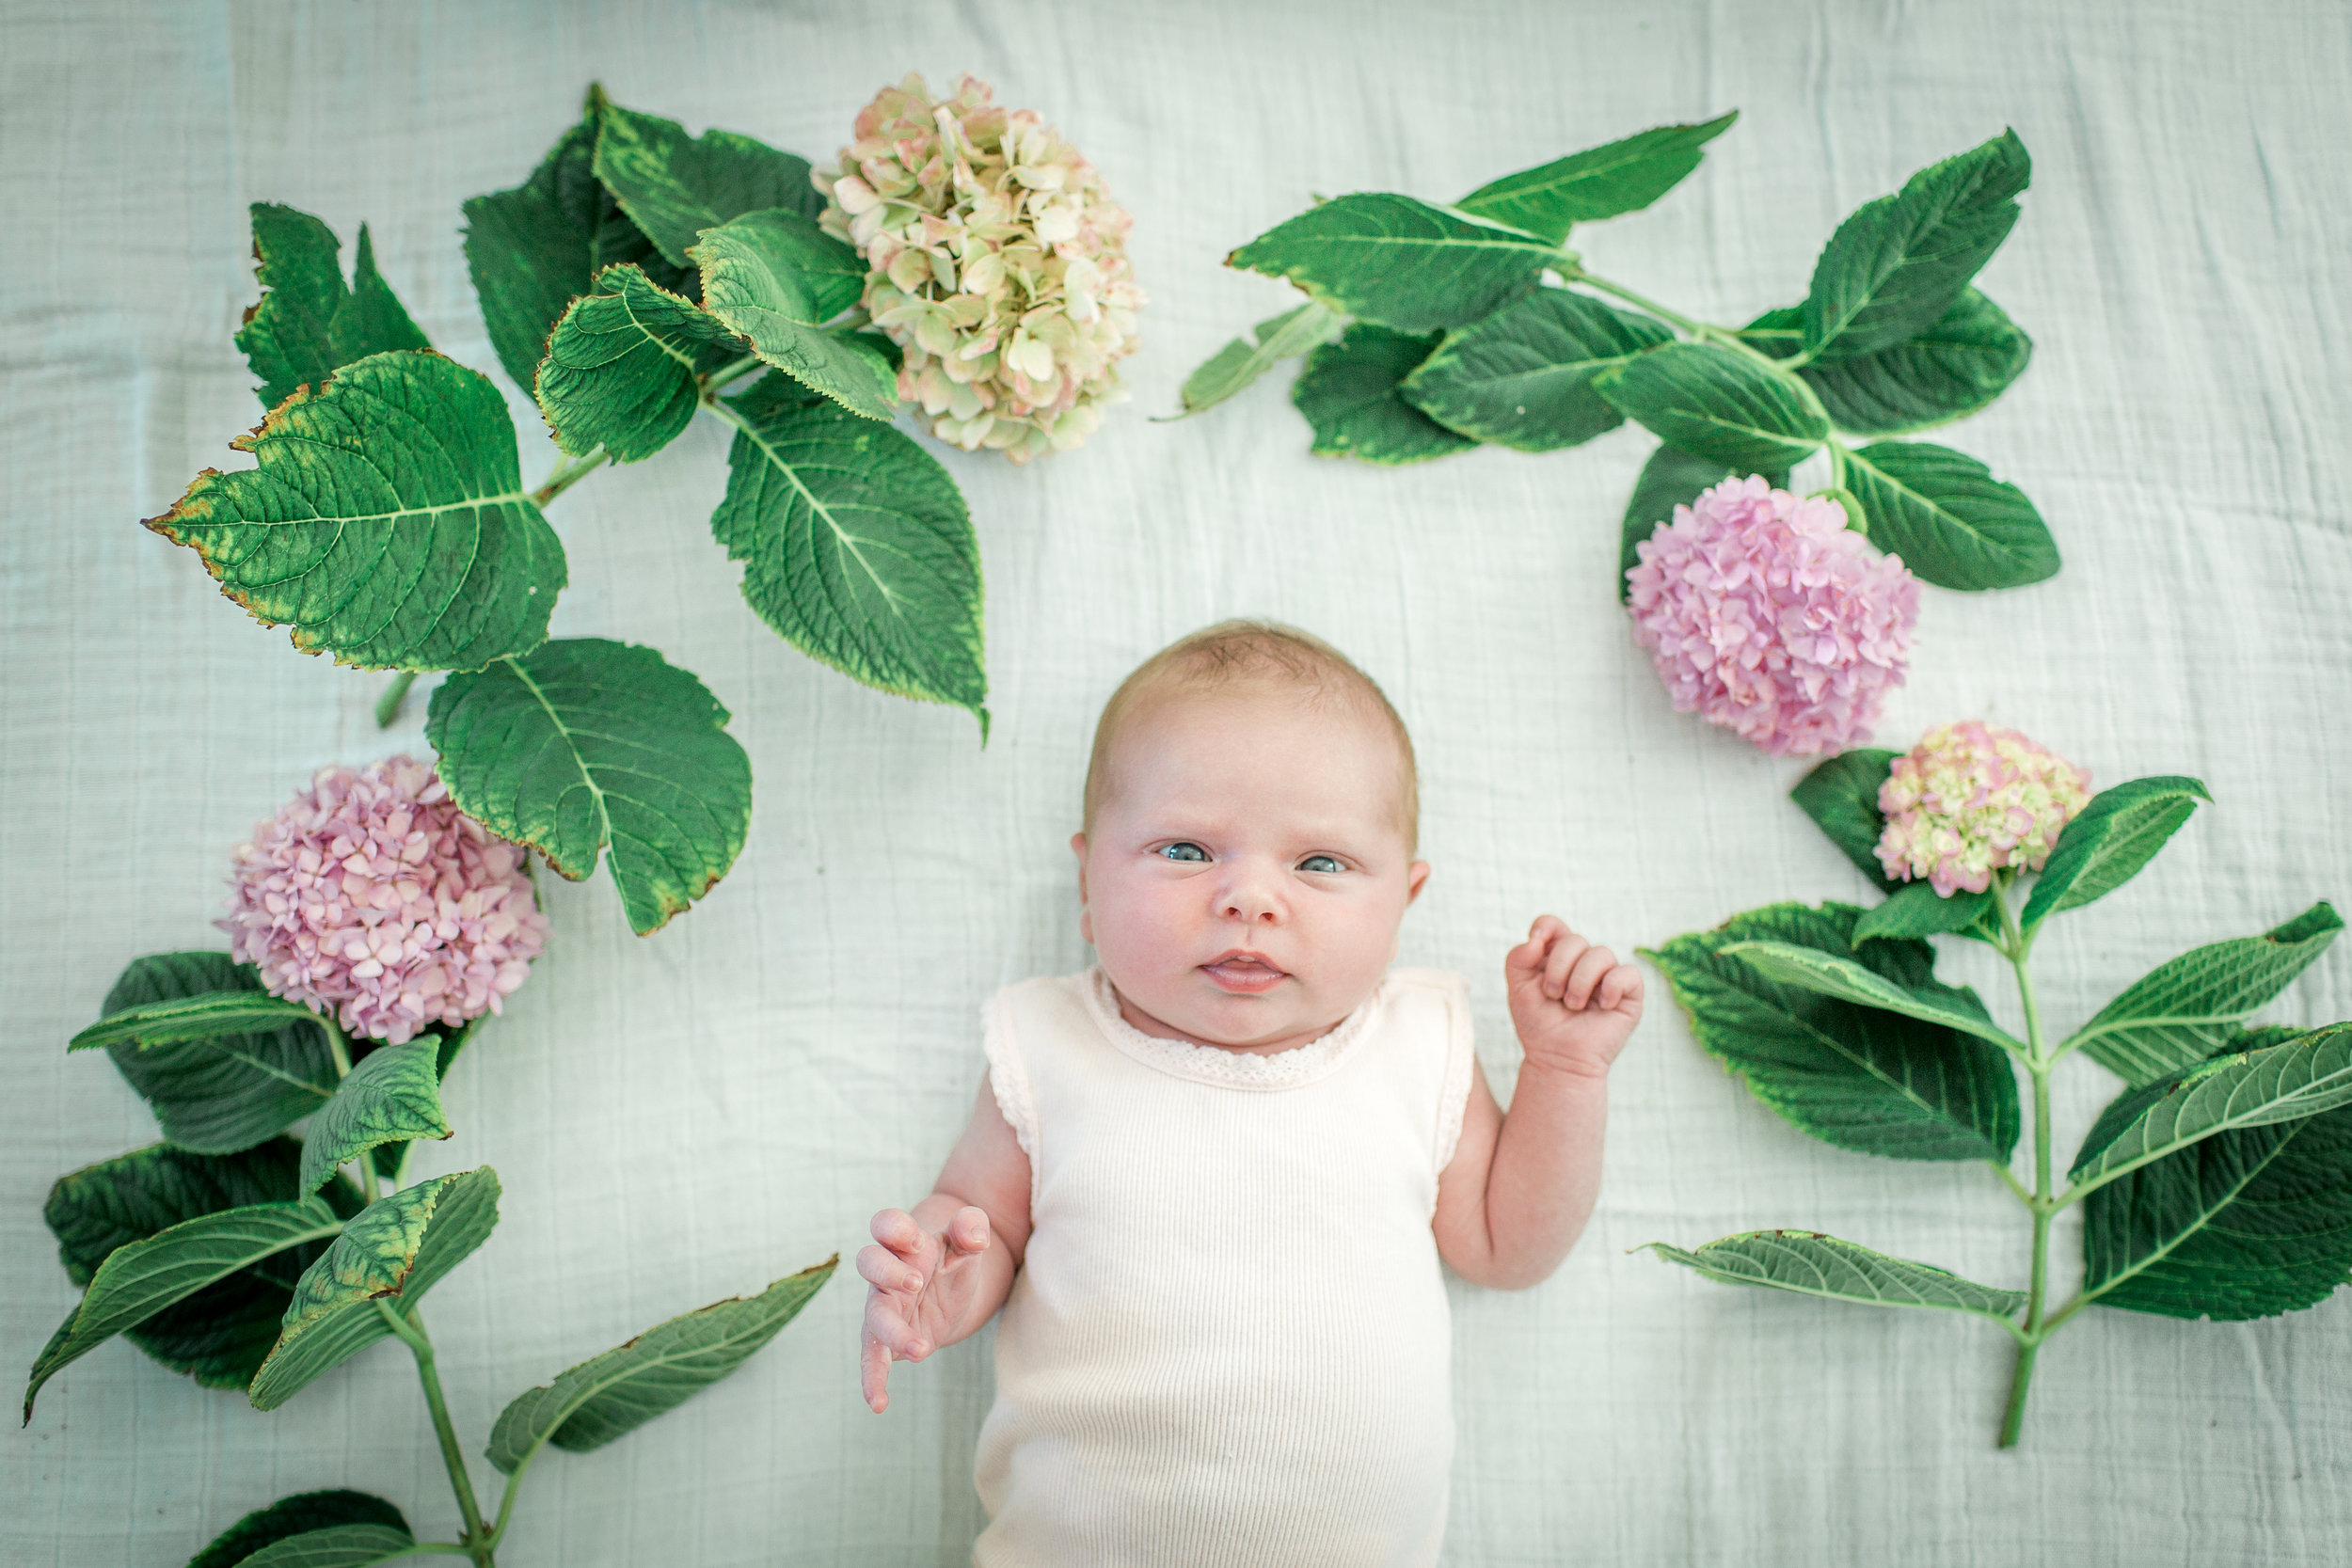 Newborn_Plunkett-1.jpg